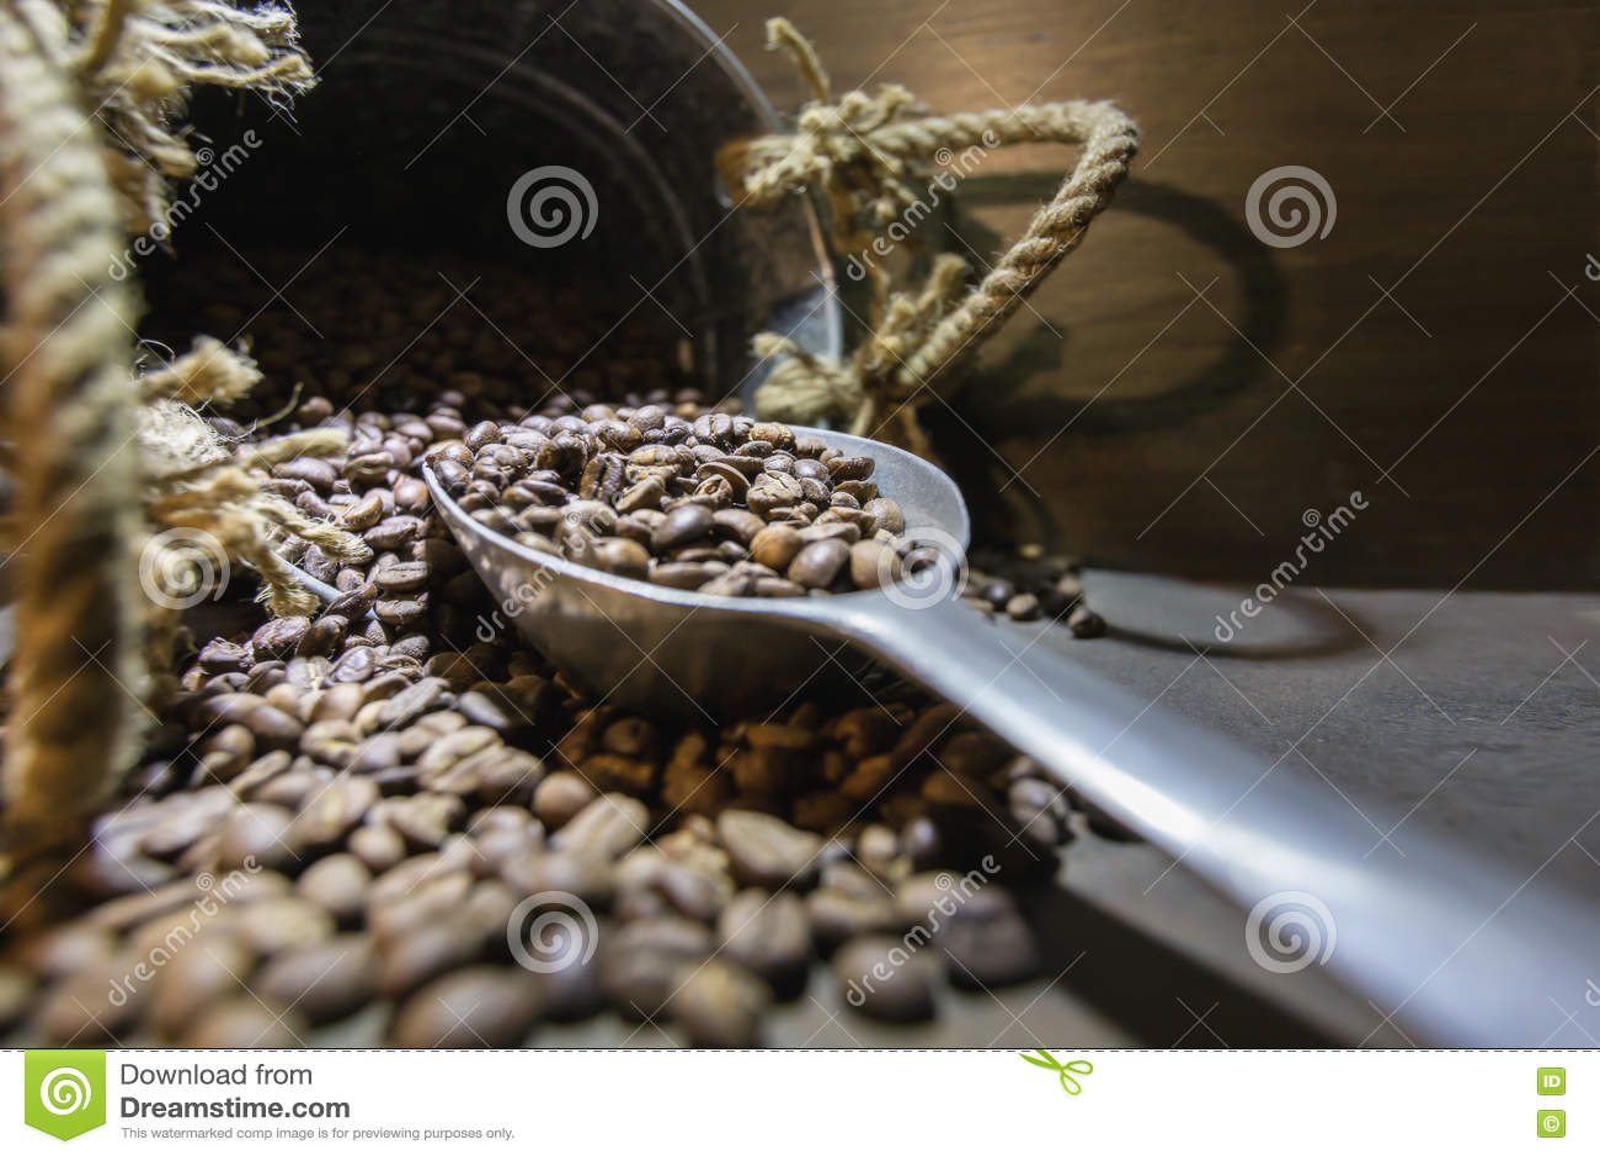 Натюрморт - чашка кофе, сумка и ветроуловитель на старом ржавом backgroun